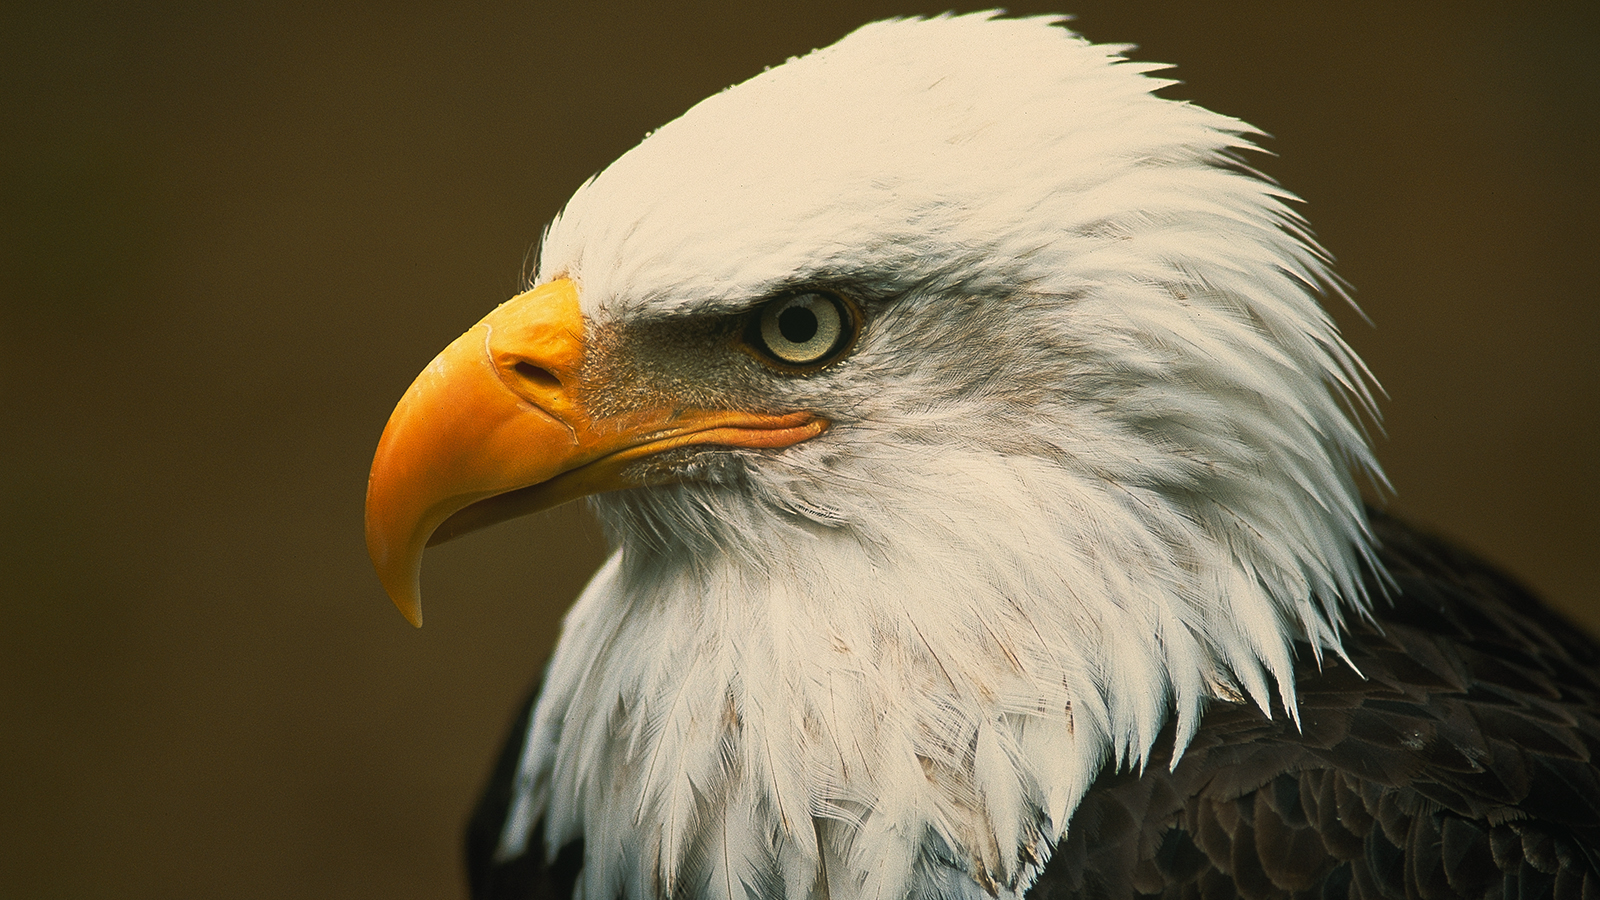 HQ Eagle Wallpapers | File 1184.34Kb